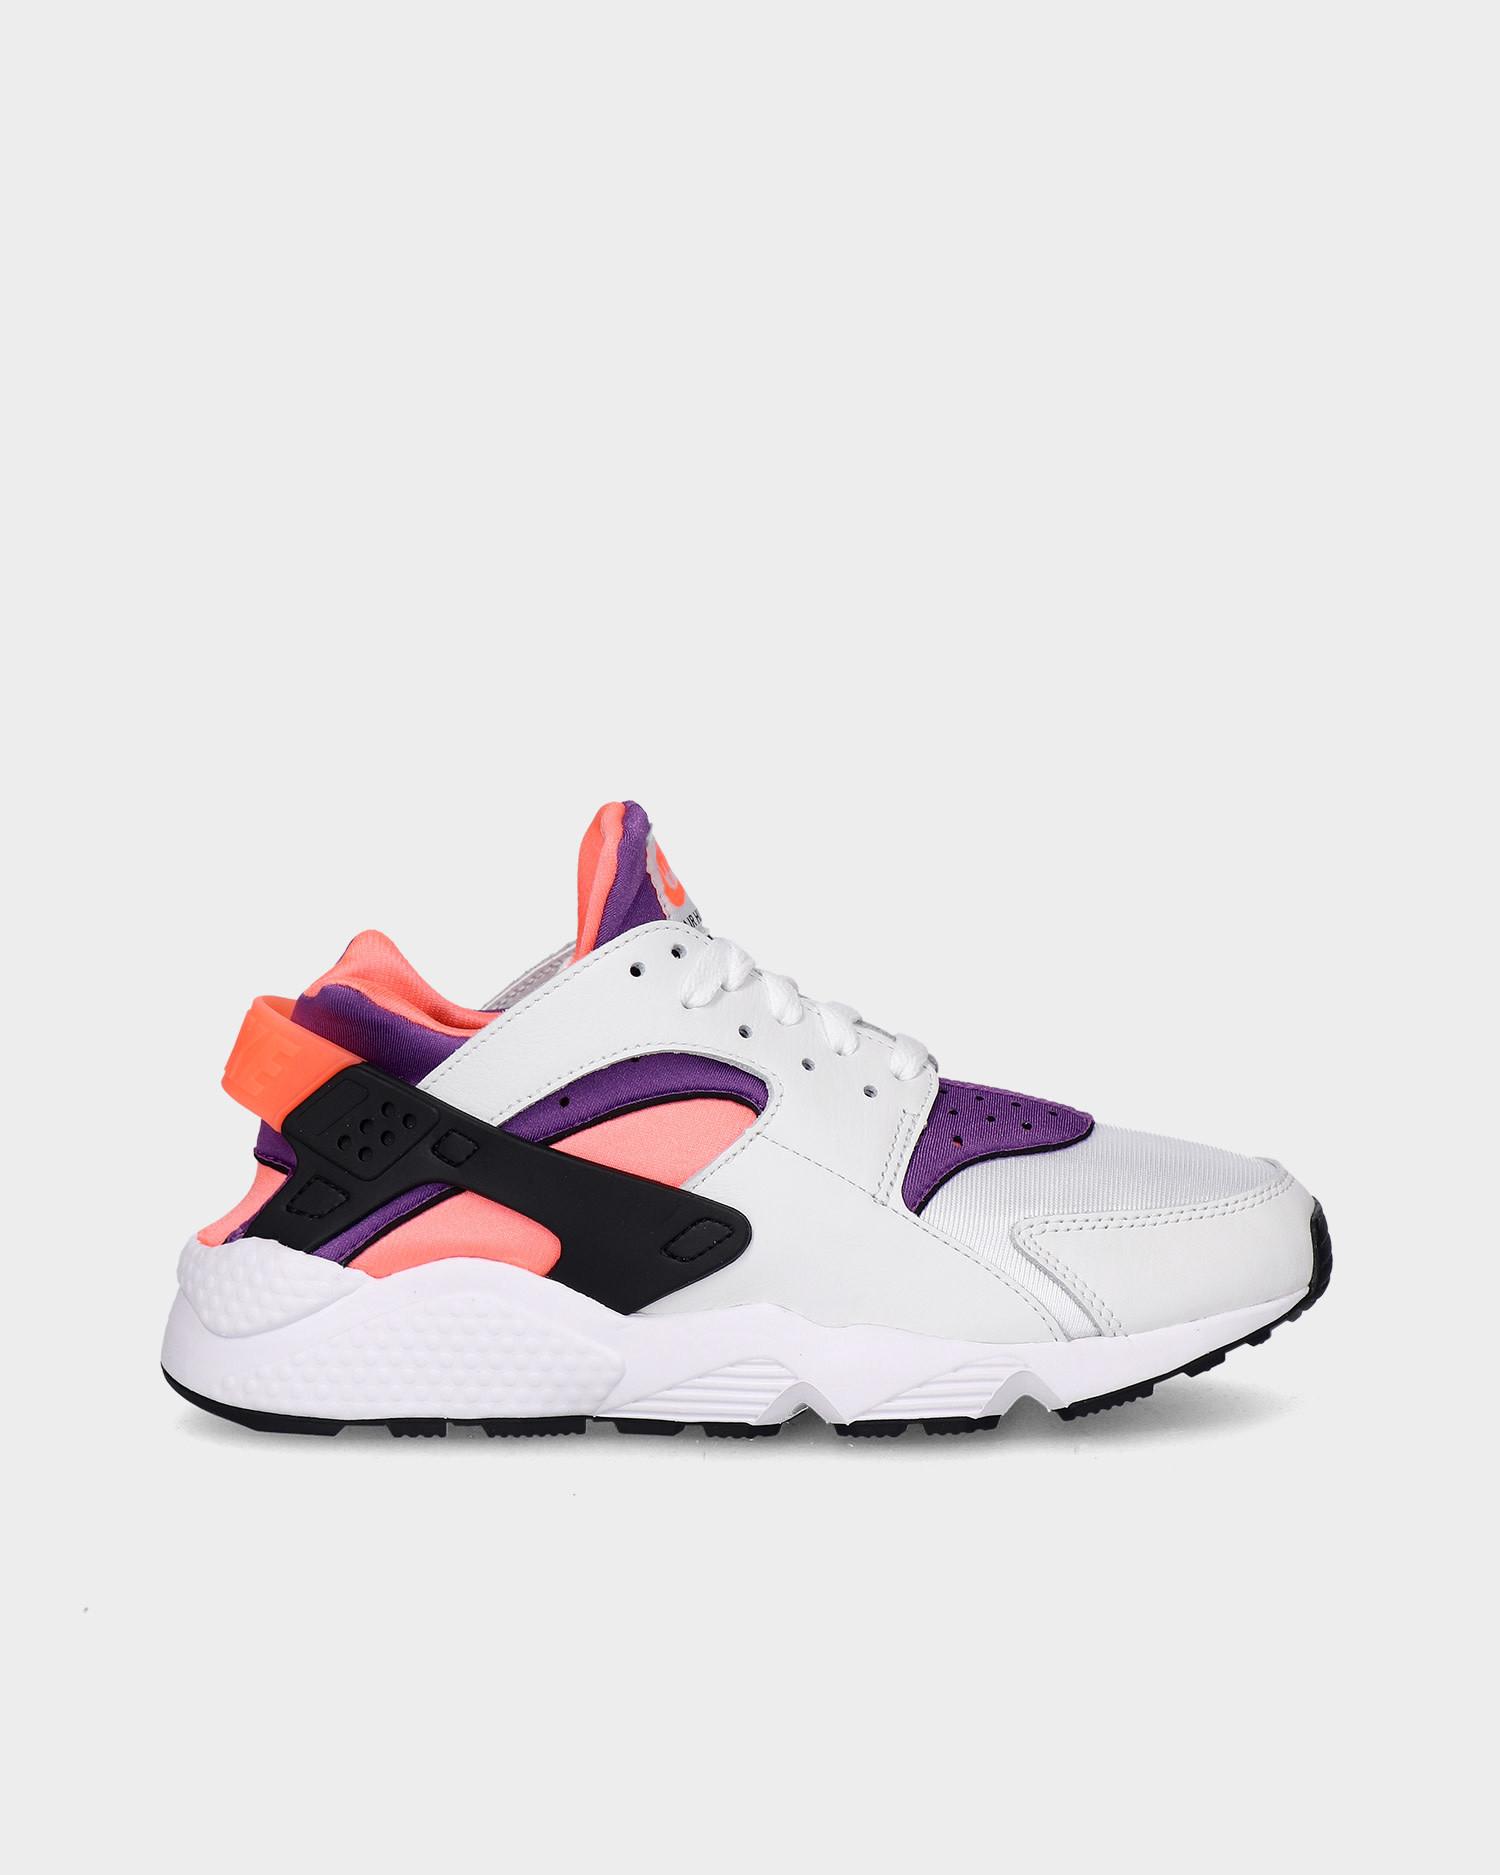 Nike Air Huarache White/purple-bright mango-black